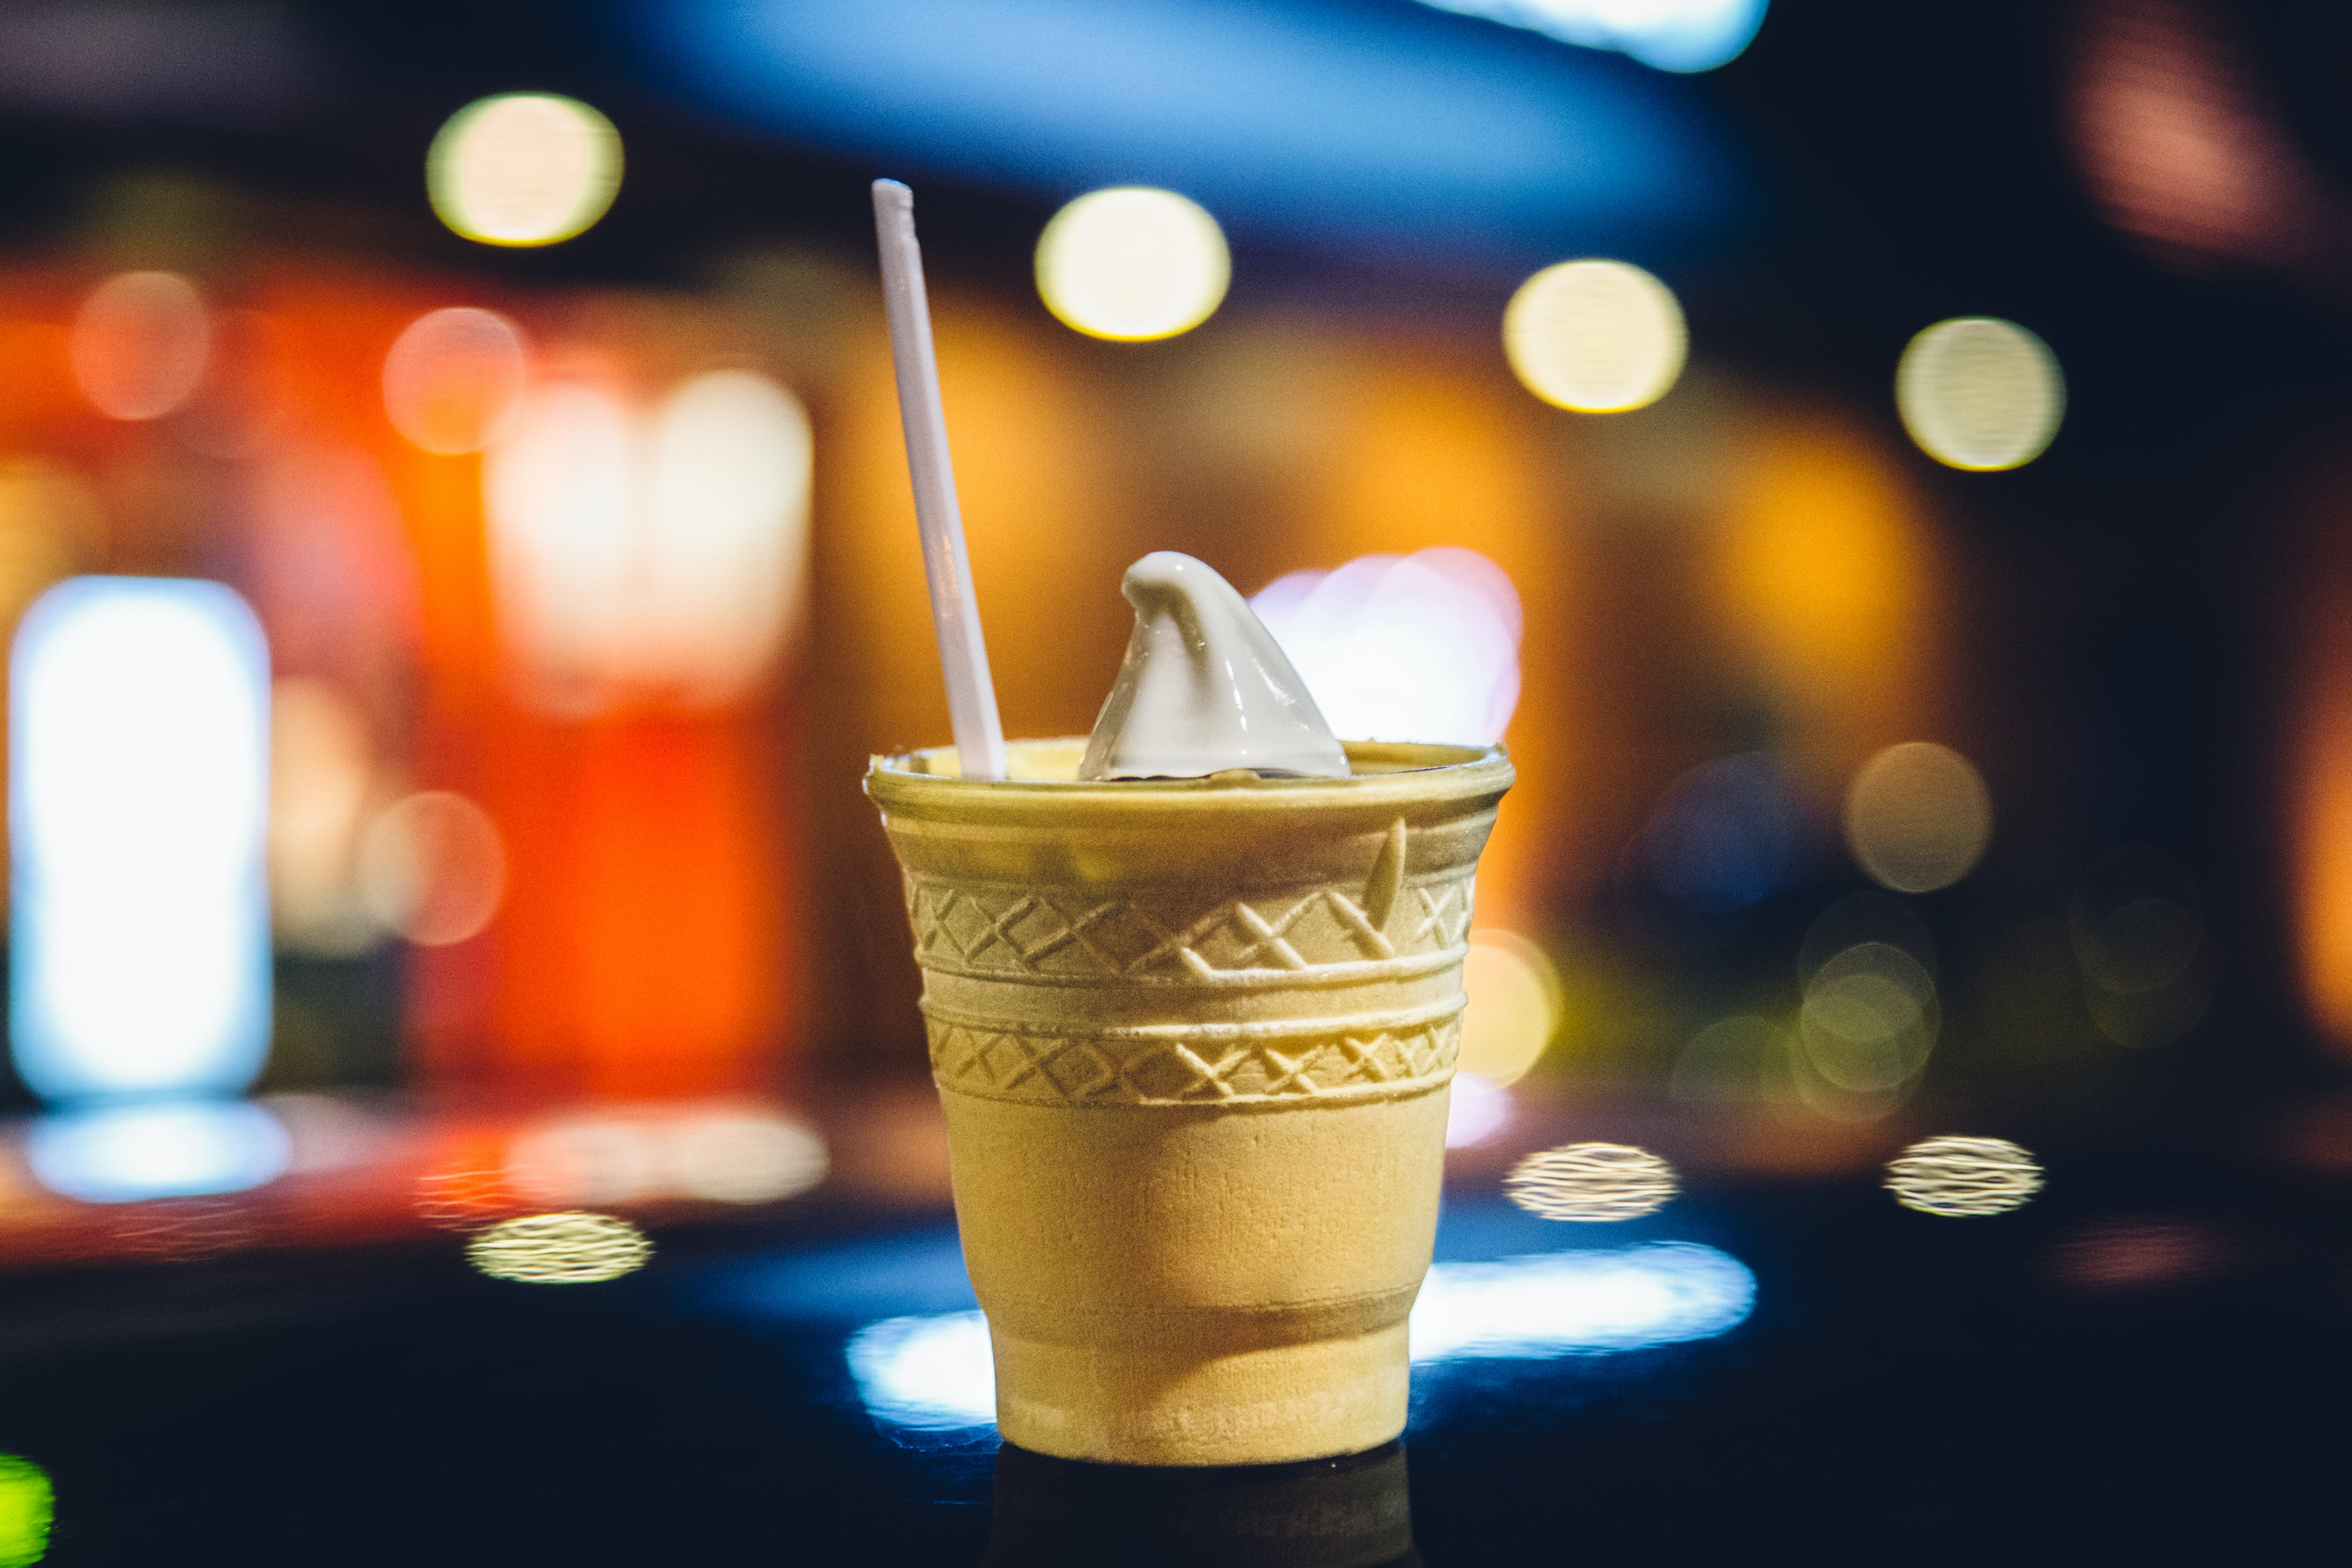 Beige Cone Filled With White Vanilla Ice Cream